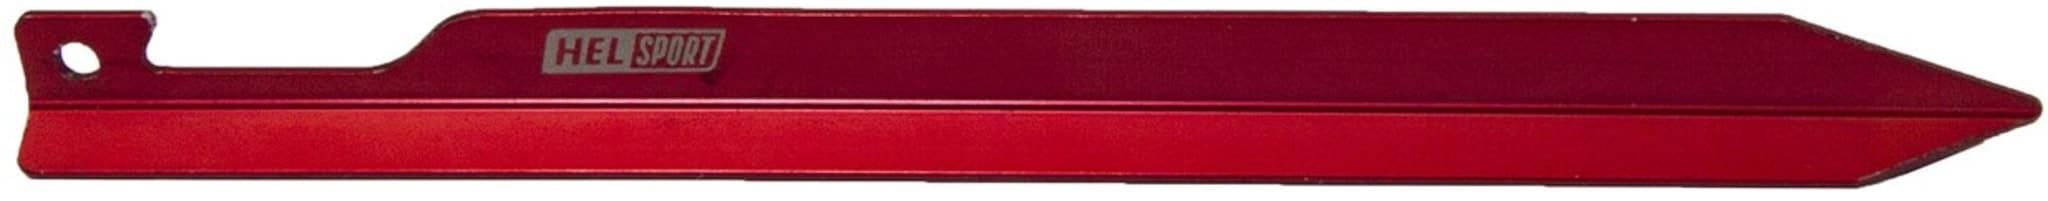 Aluminiumsplugger 19cm 10stk